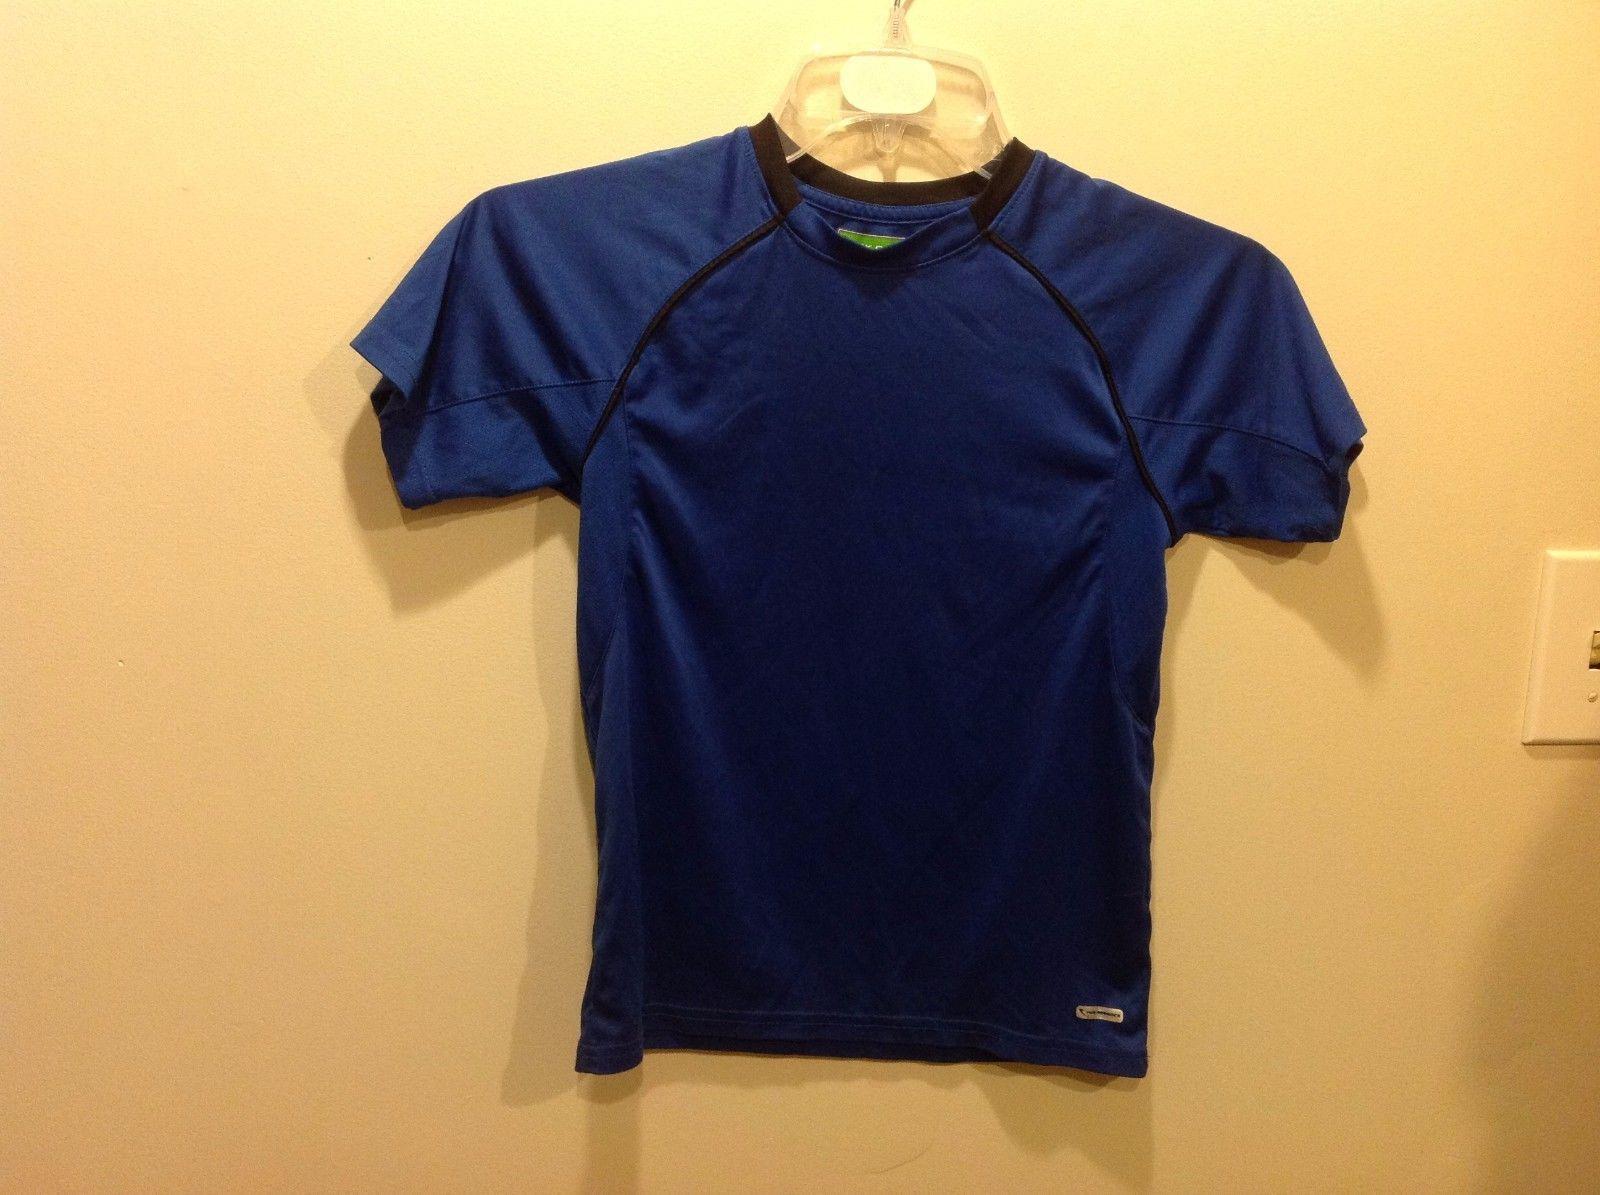 TEK GEAR Royal Blue Young Kids Flex Sportswear T Shirt Sz M